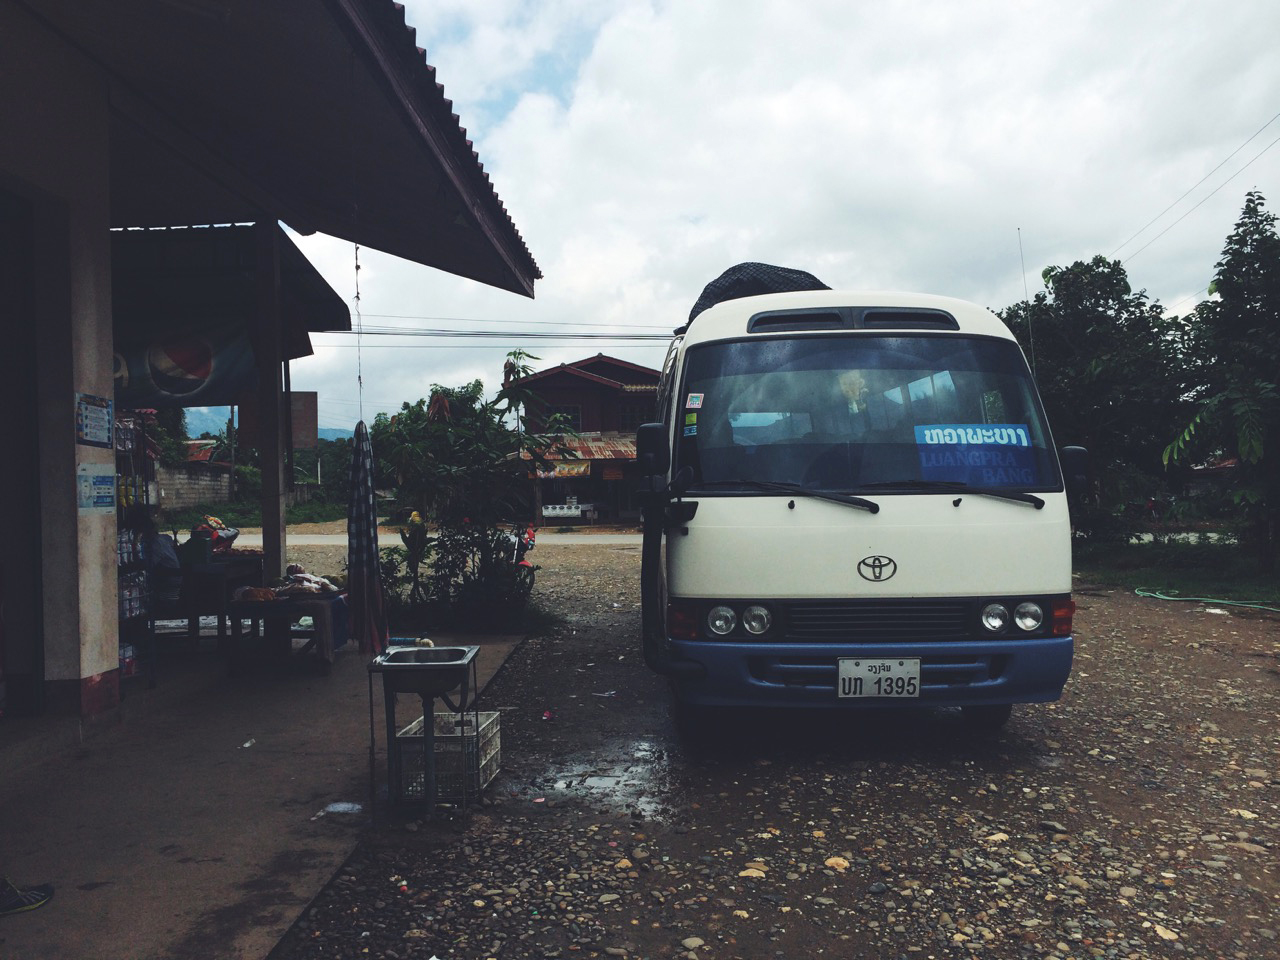 Путешествие по Лаосу: Микроавтобус до Луанг Прабанга